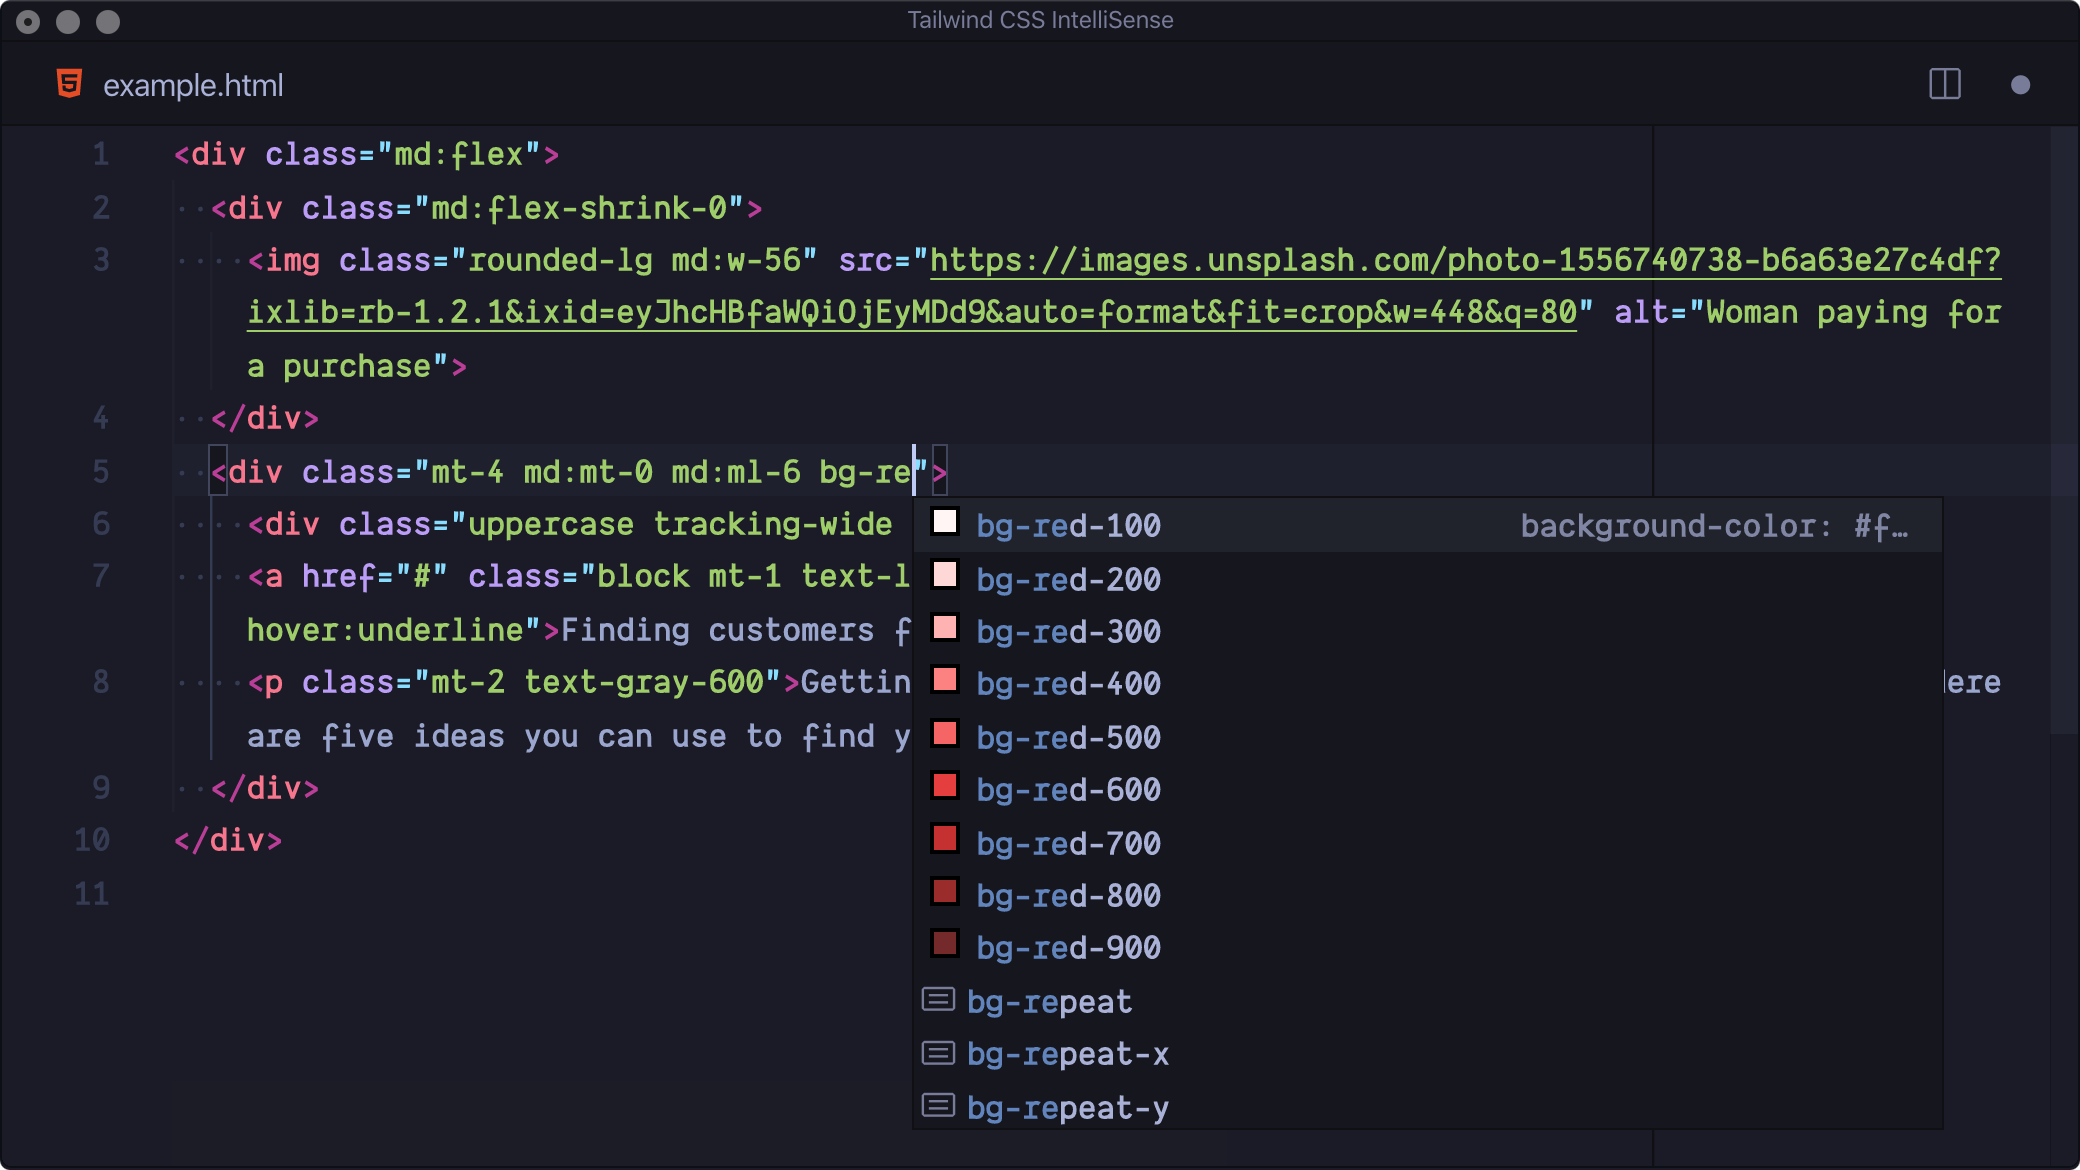 Autocomplete of Tailwind CSS Intellisense